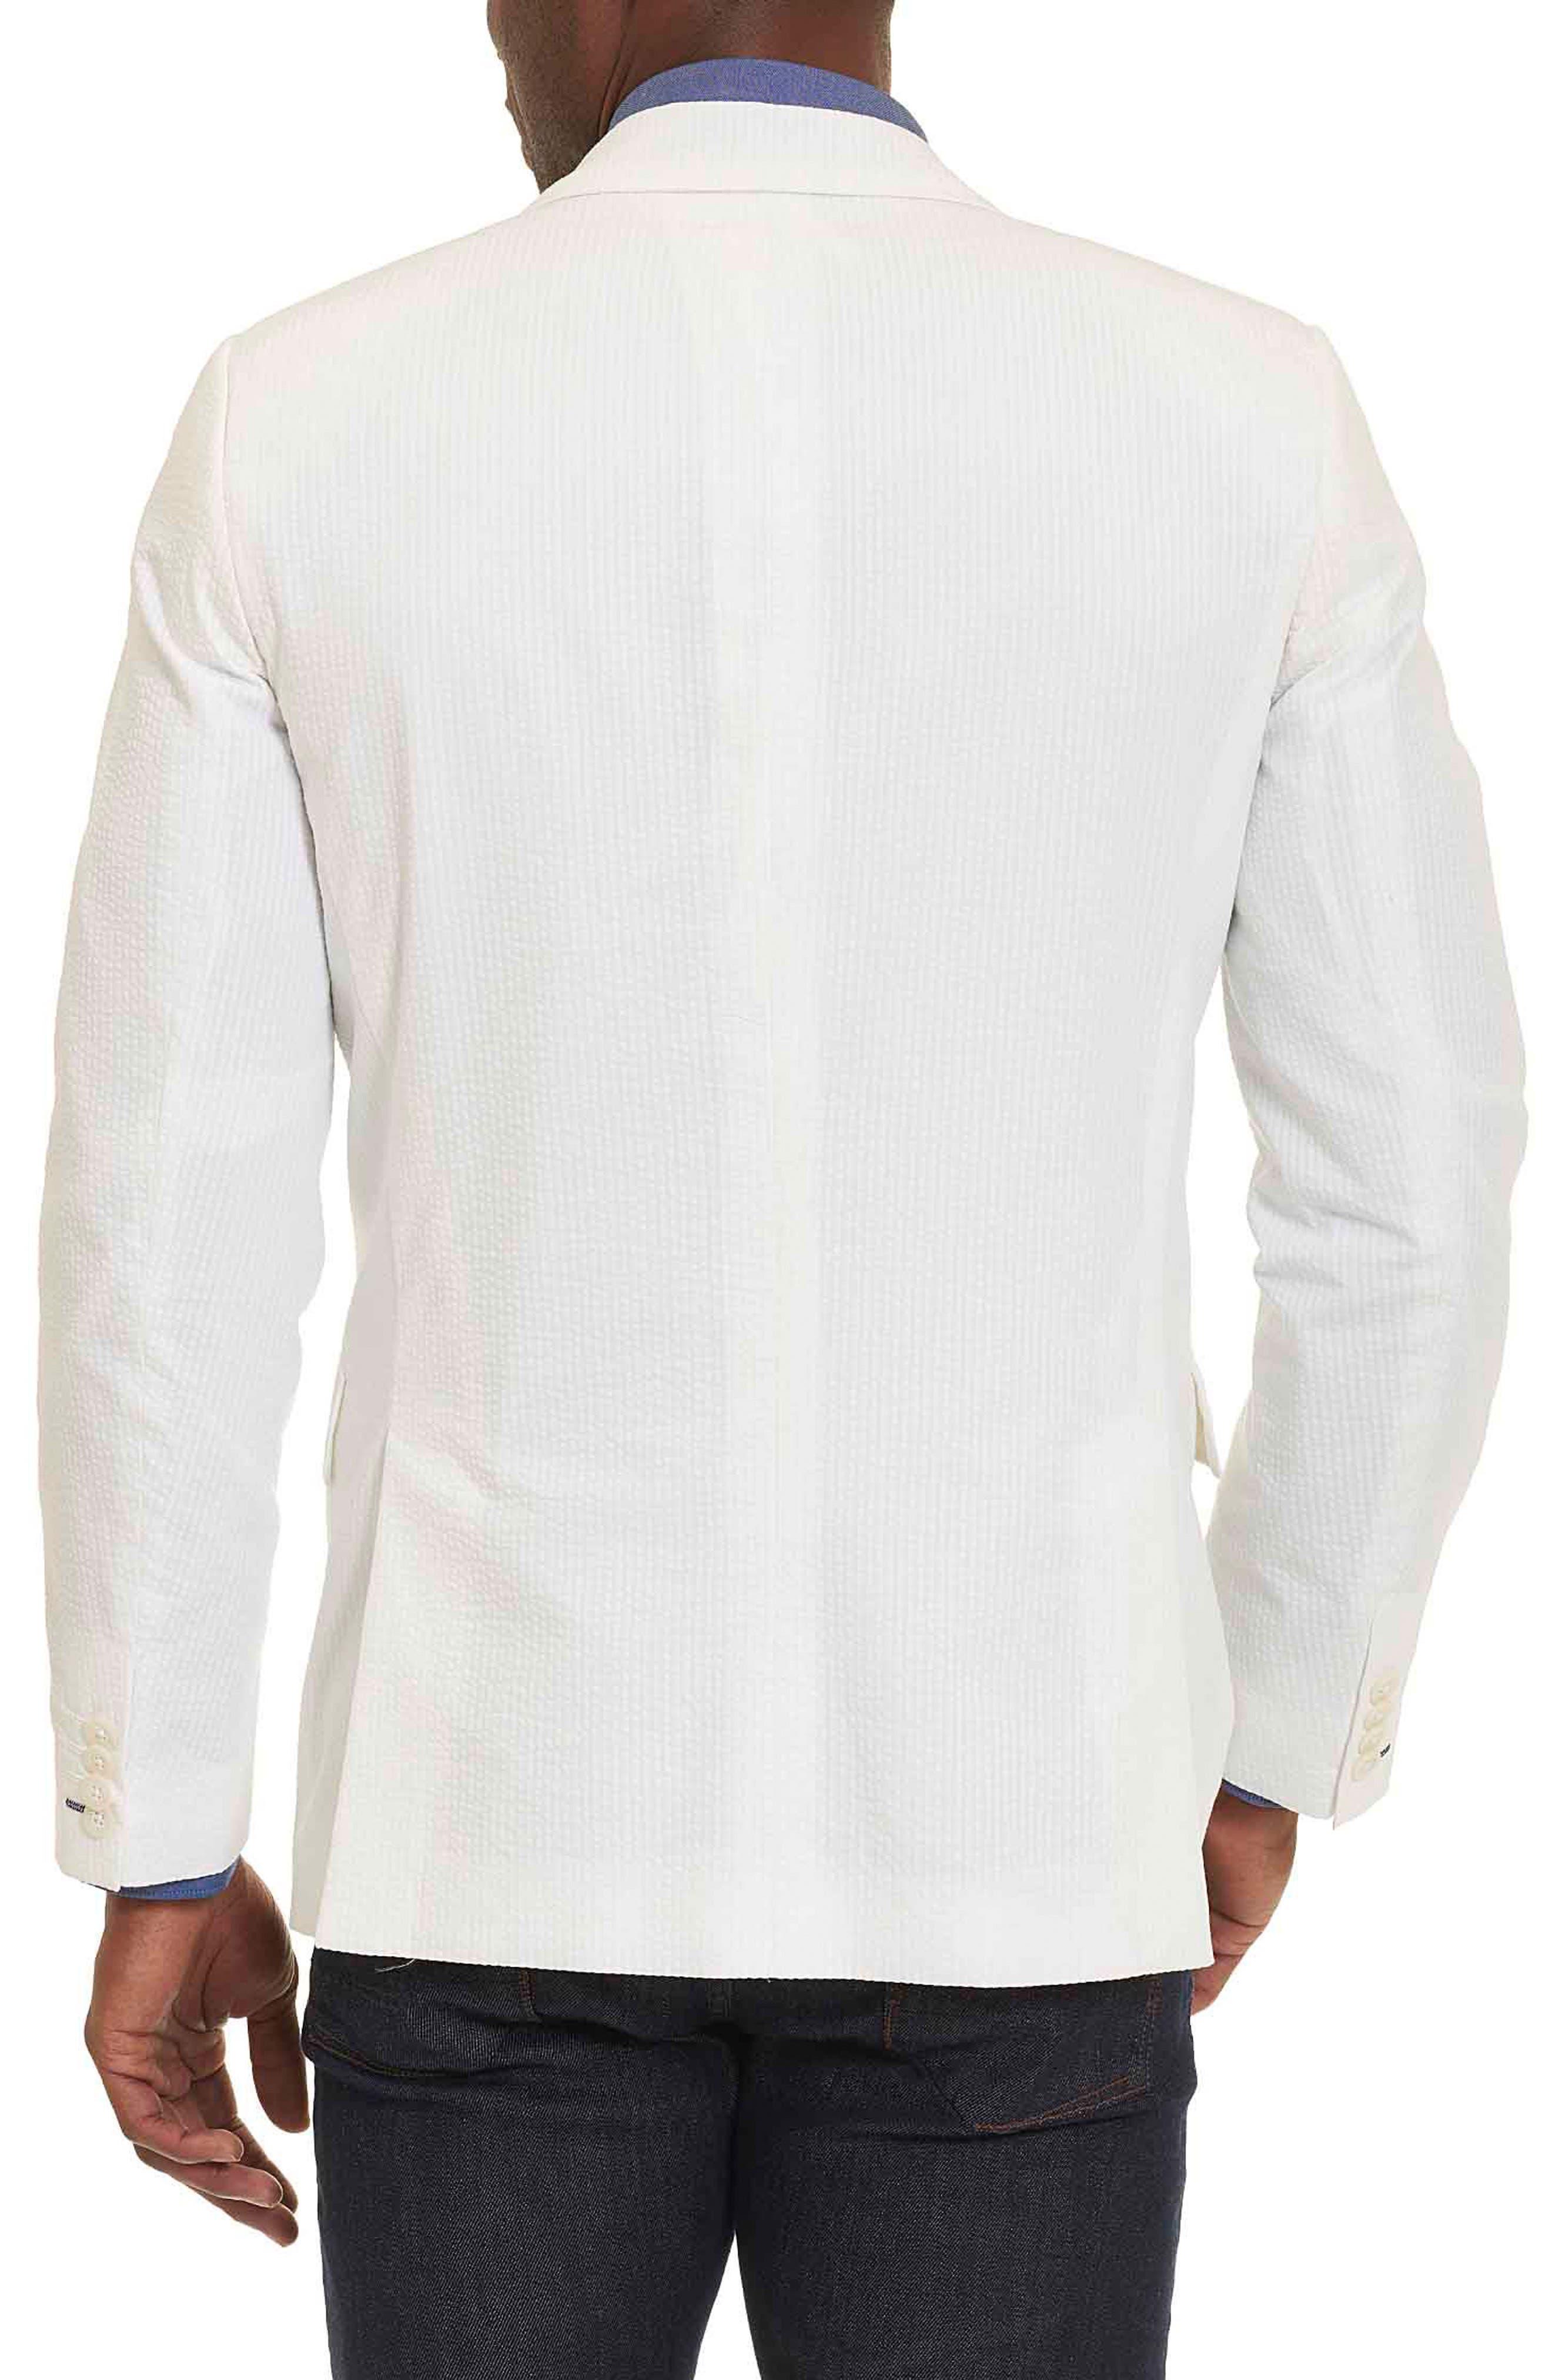 Castroville Classic Fit Sport Coat,                             Alternate thumbnail 2, color,                             White